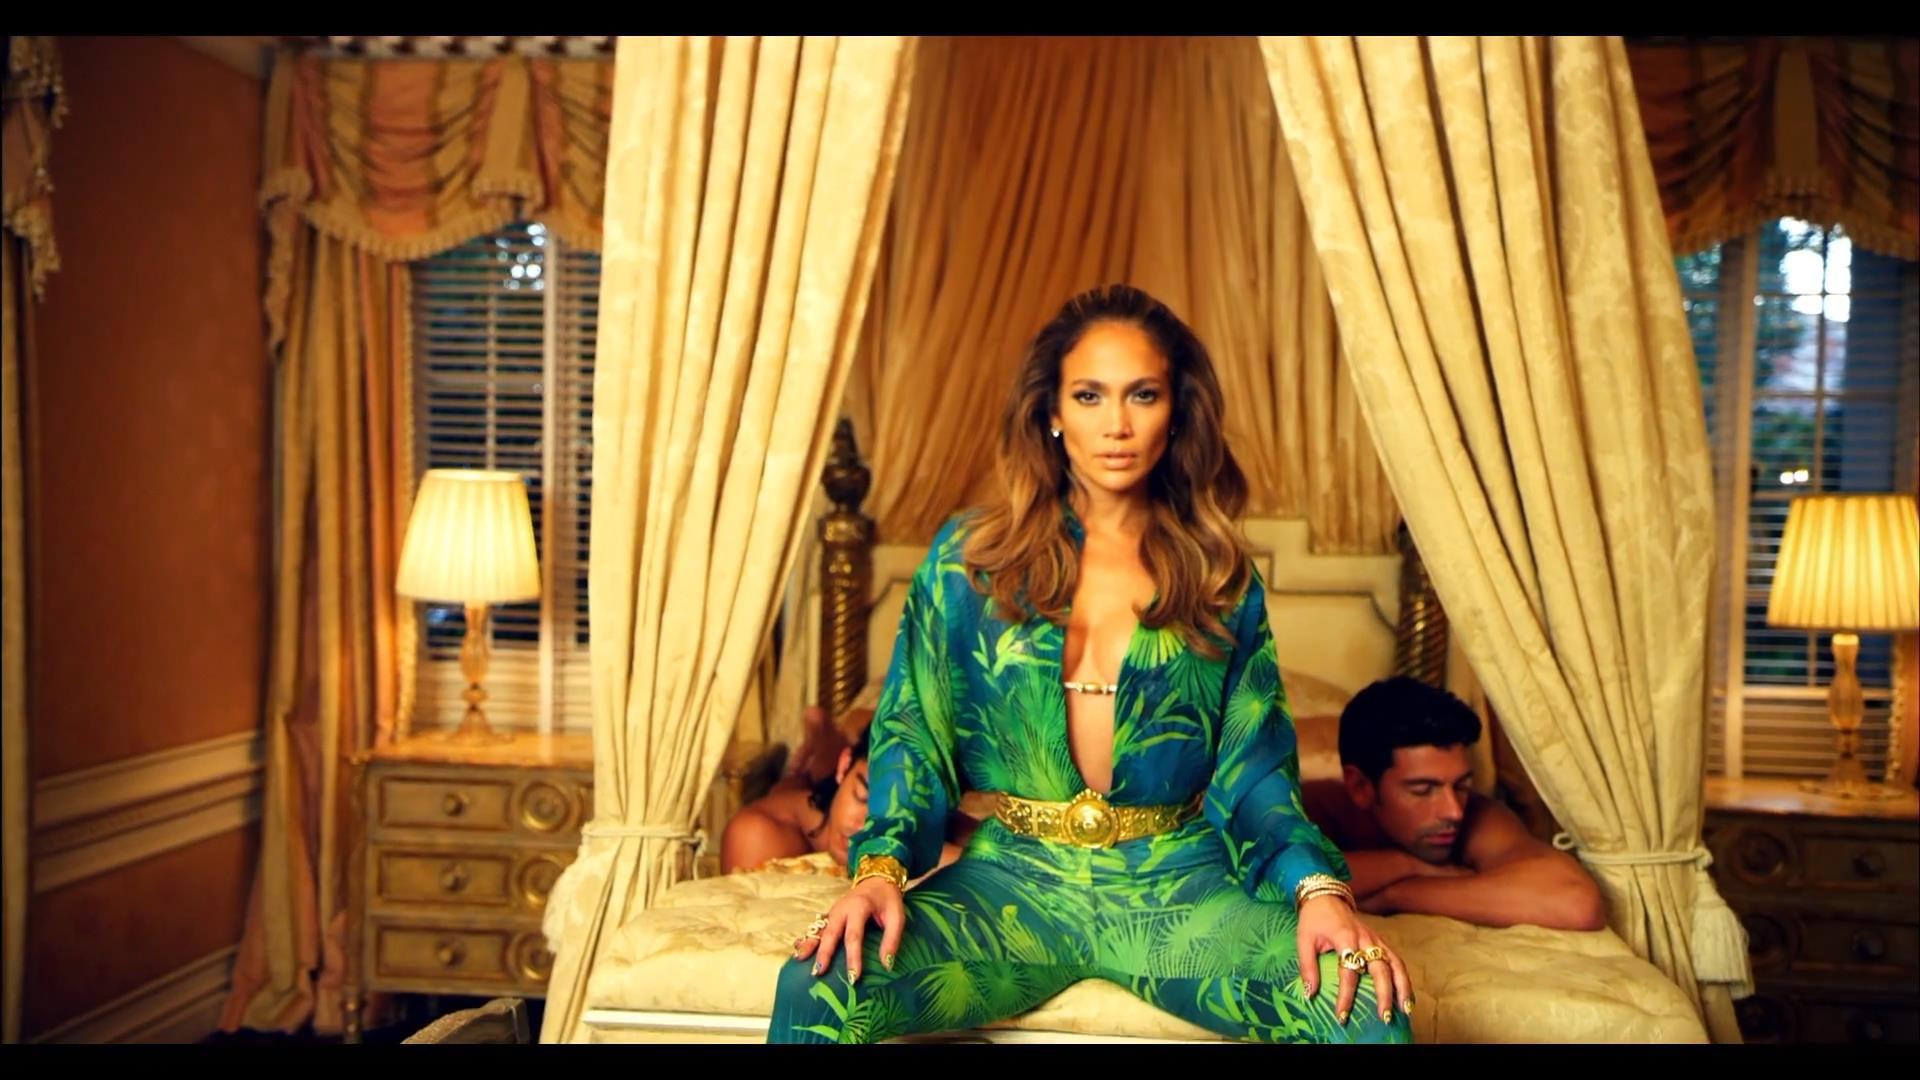 Jennifer Lopez - I Luh Ya Papi ft. French Montana (Video